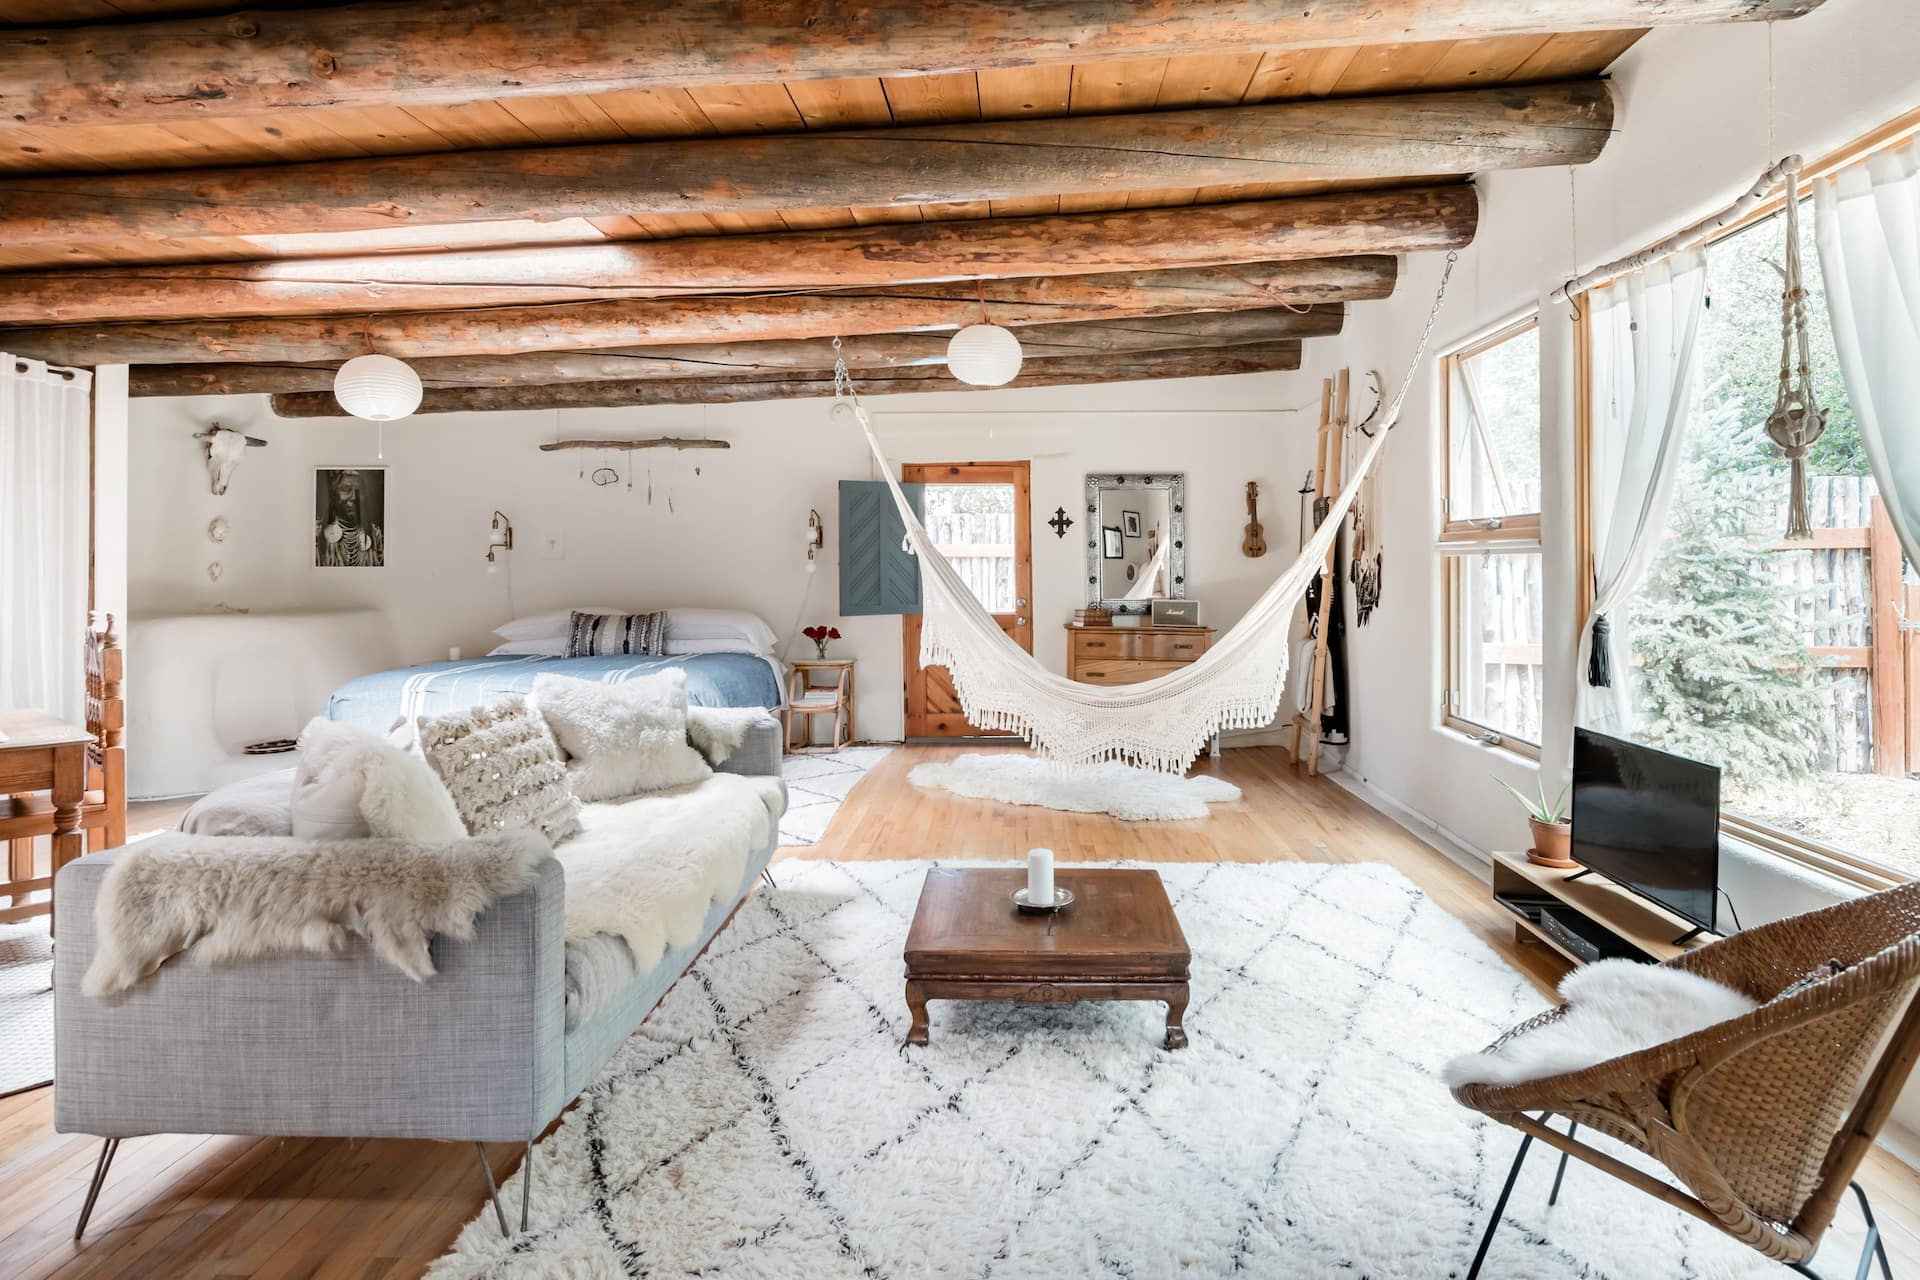 the Casita Benitez boho adobe Airbnb in New Mexico